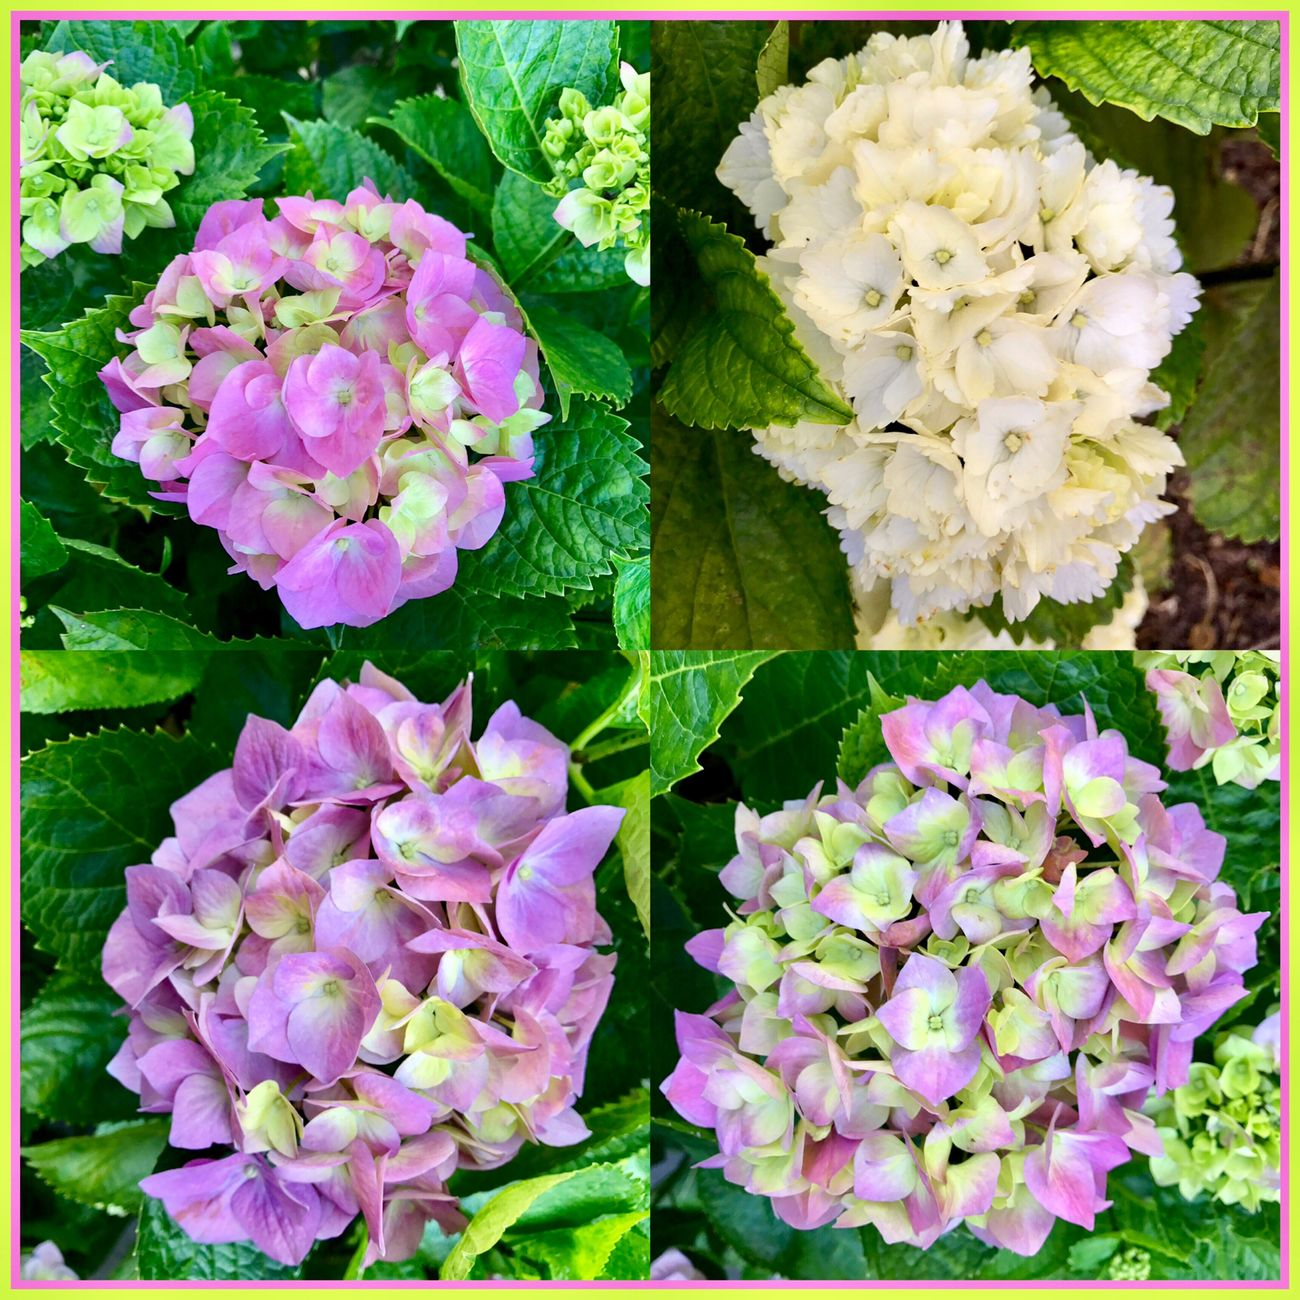 hydrangeas in full bloom 🌸🌺🌸 Hydrangeas Flowers Hydrangerasbush FullBlooom Flowercollage